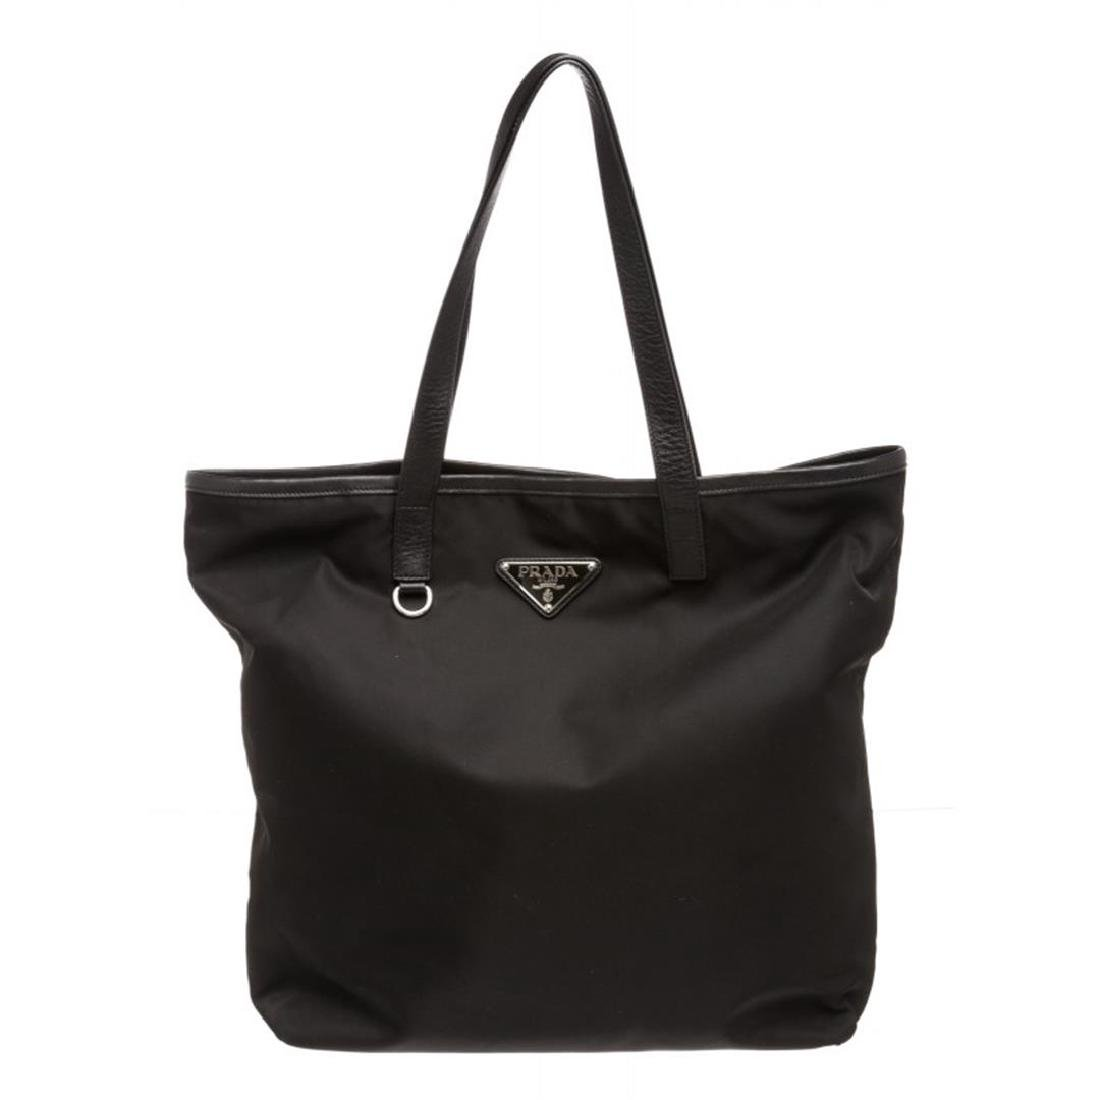 Prada Black Nylon Leather Long Tote Shoulder Bag